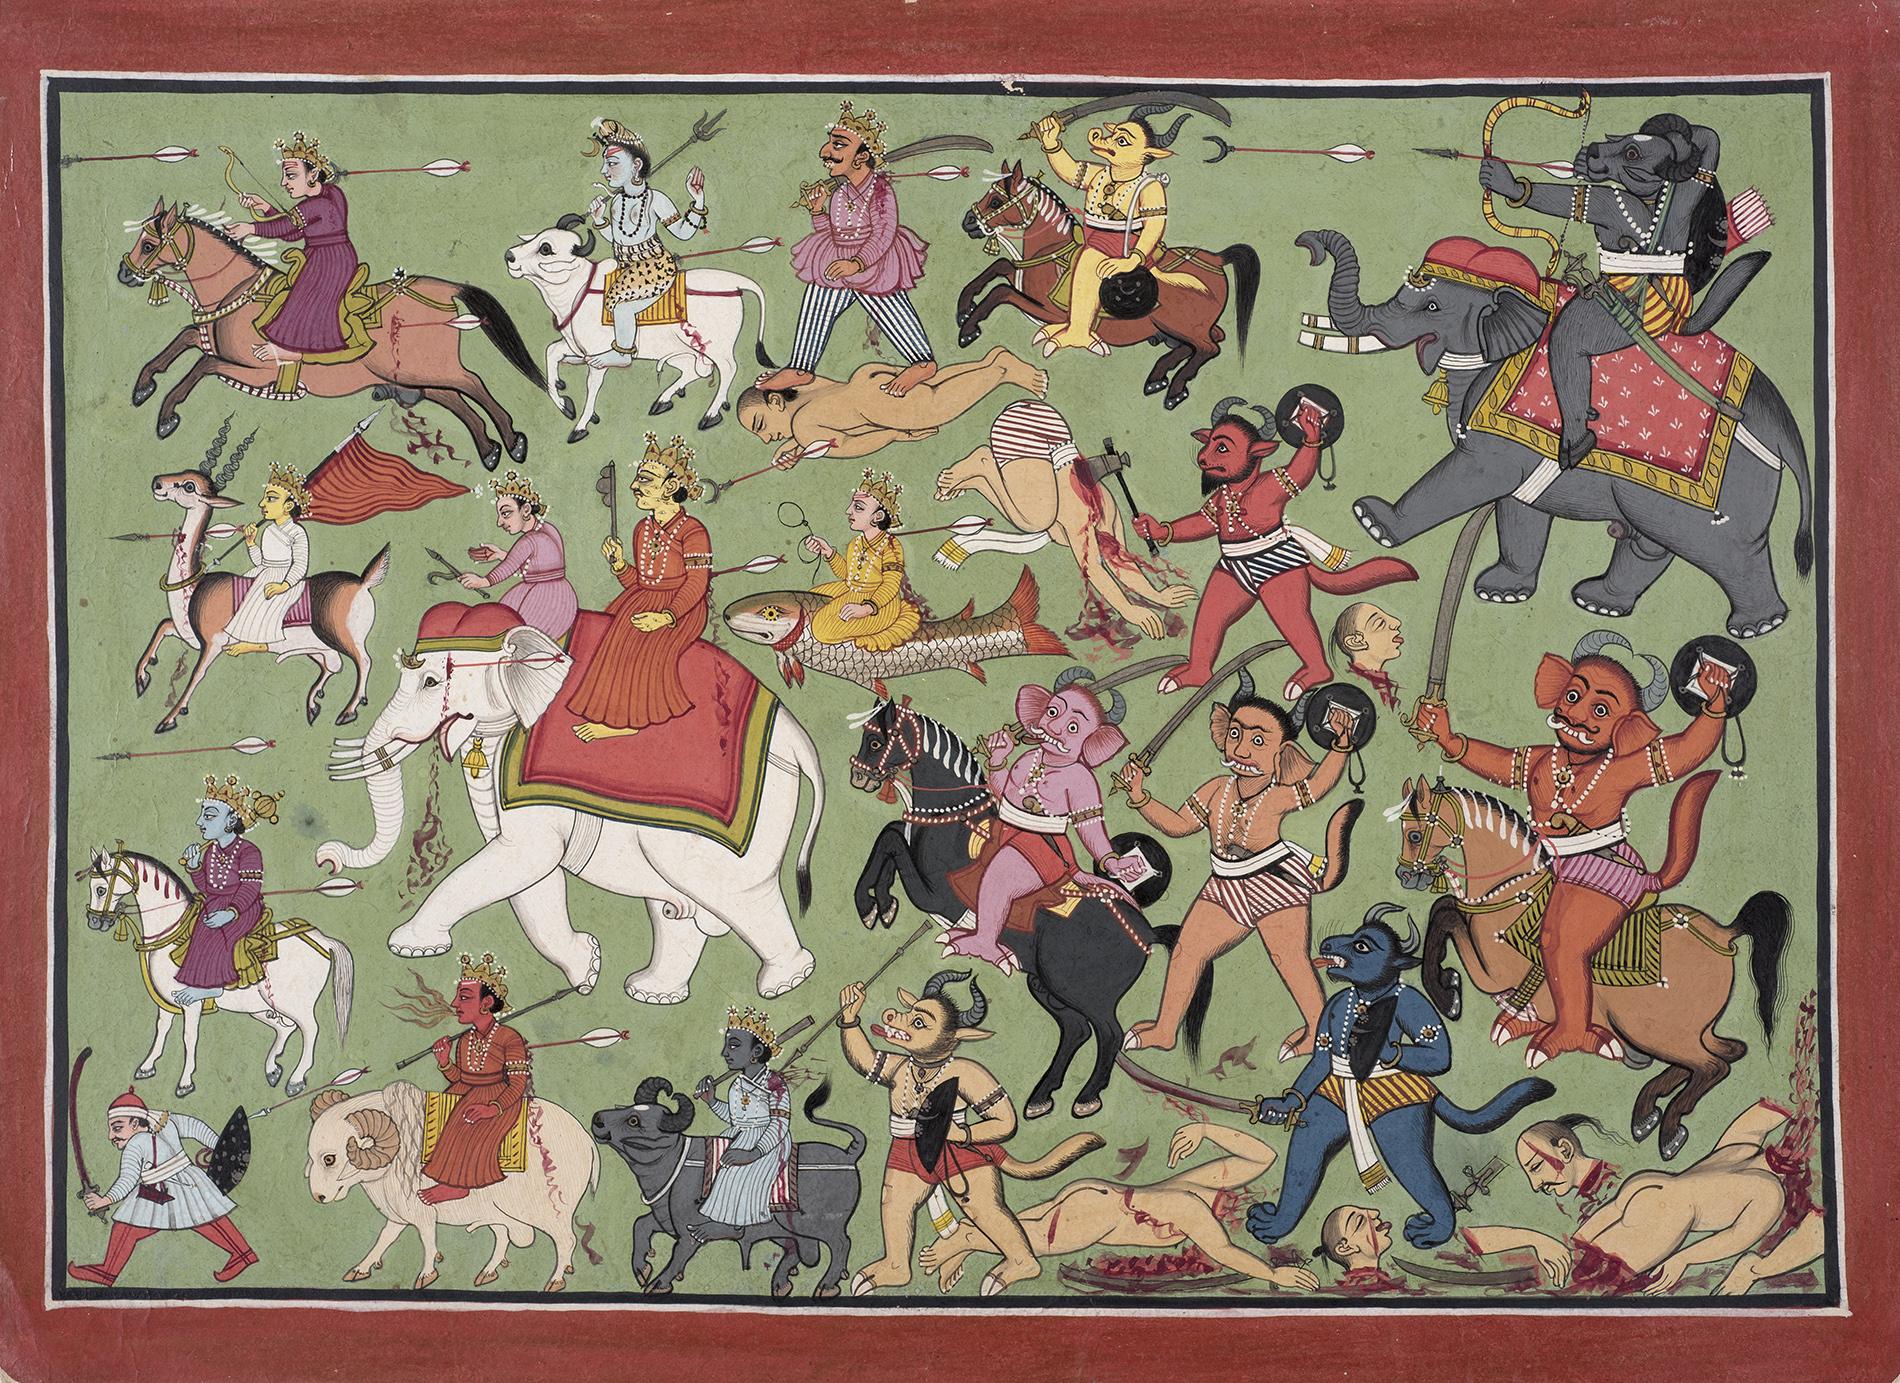 AN ILLUSTRATION TO A MARKENDEYA PURANA SERIES Mandi, India Tempera on paper Circa 1780